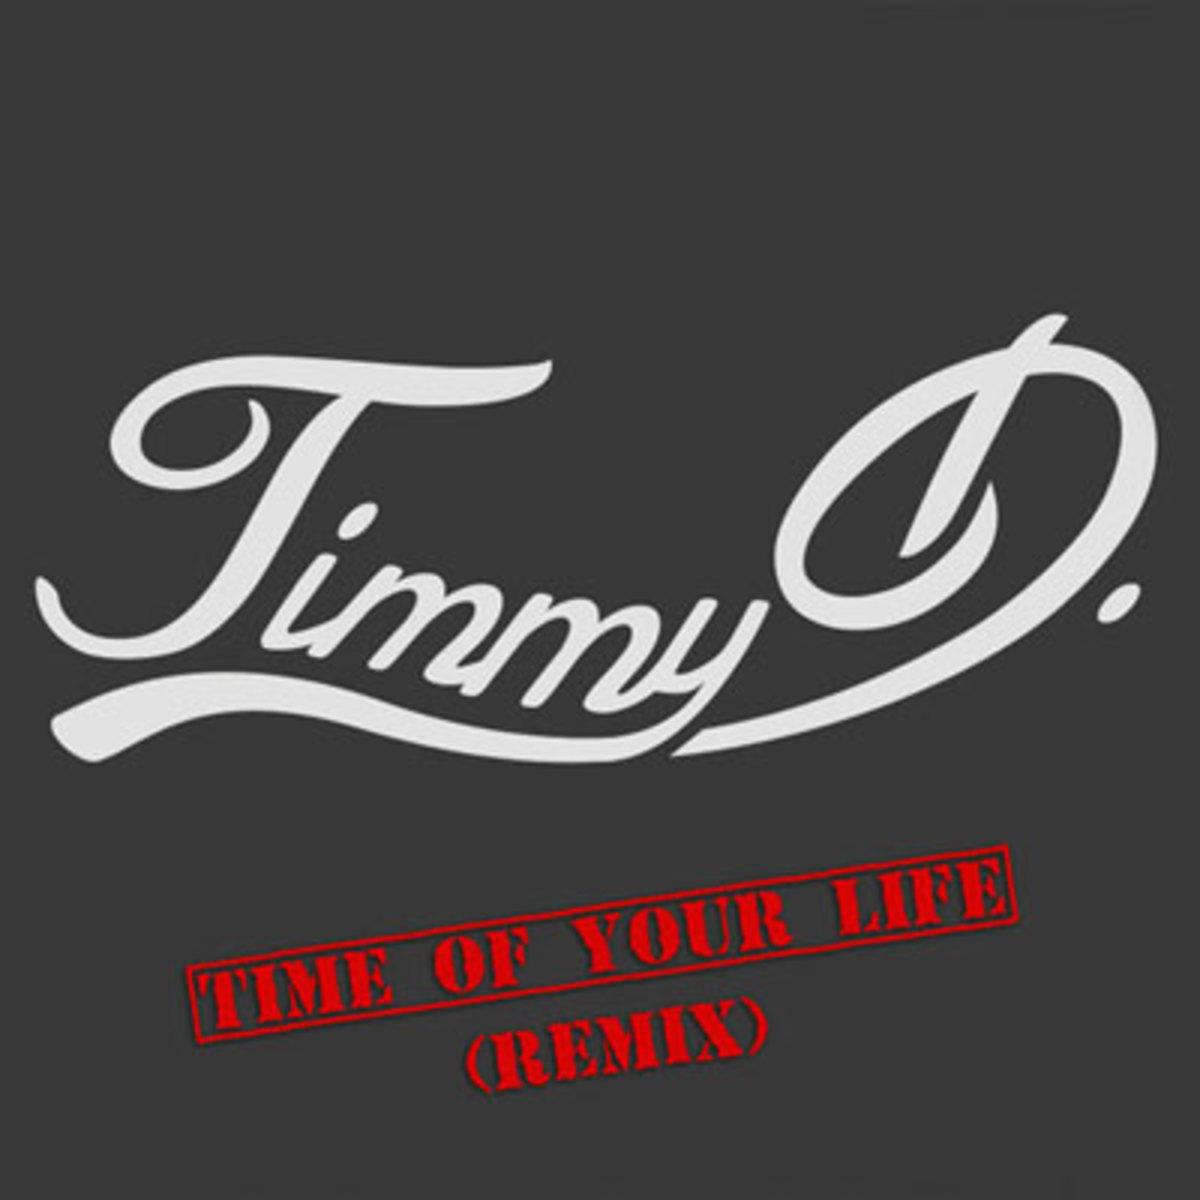 timmyd-timeofyourlife.jpg